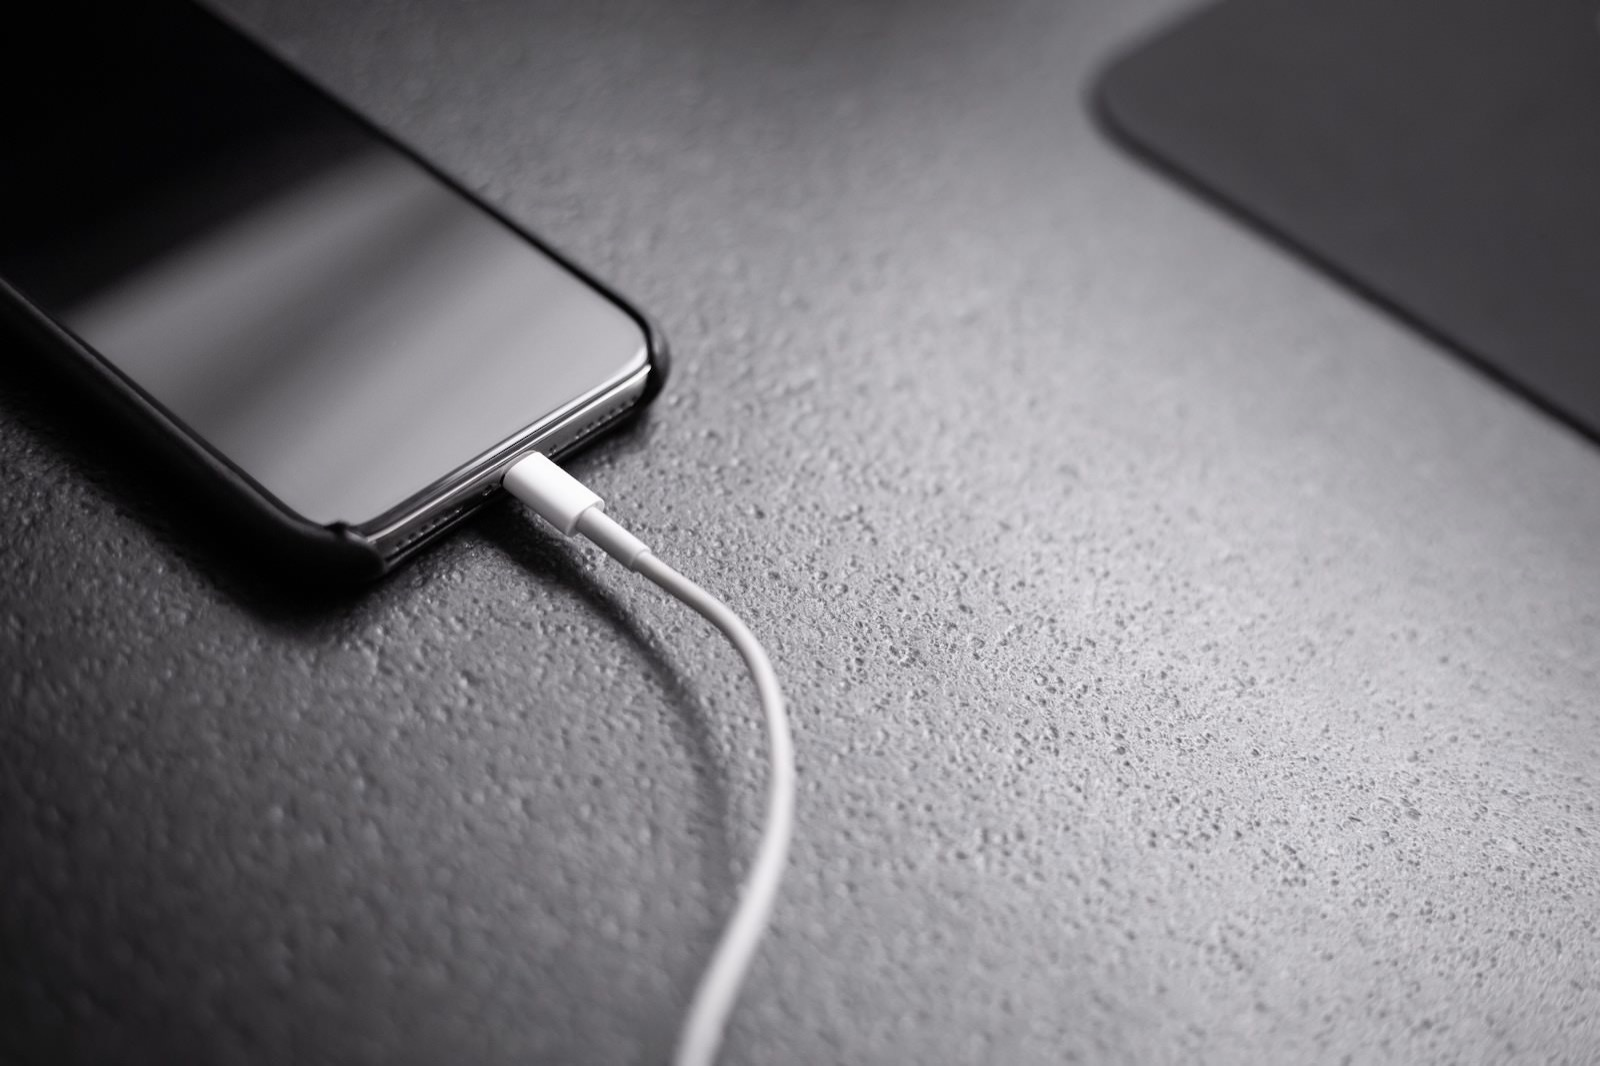 Andreas haslinger 1589200 unsplash charging iphone